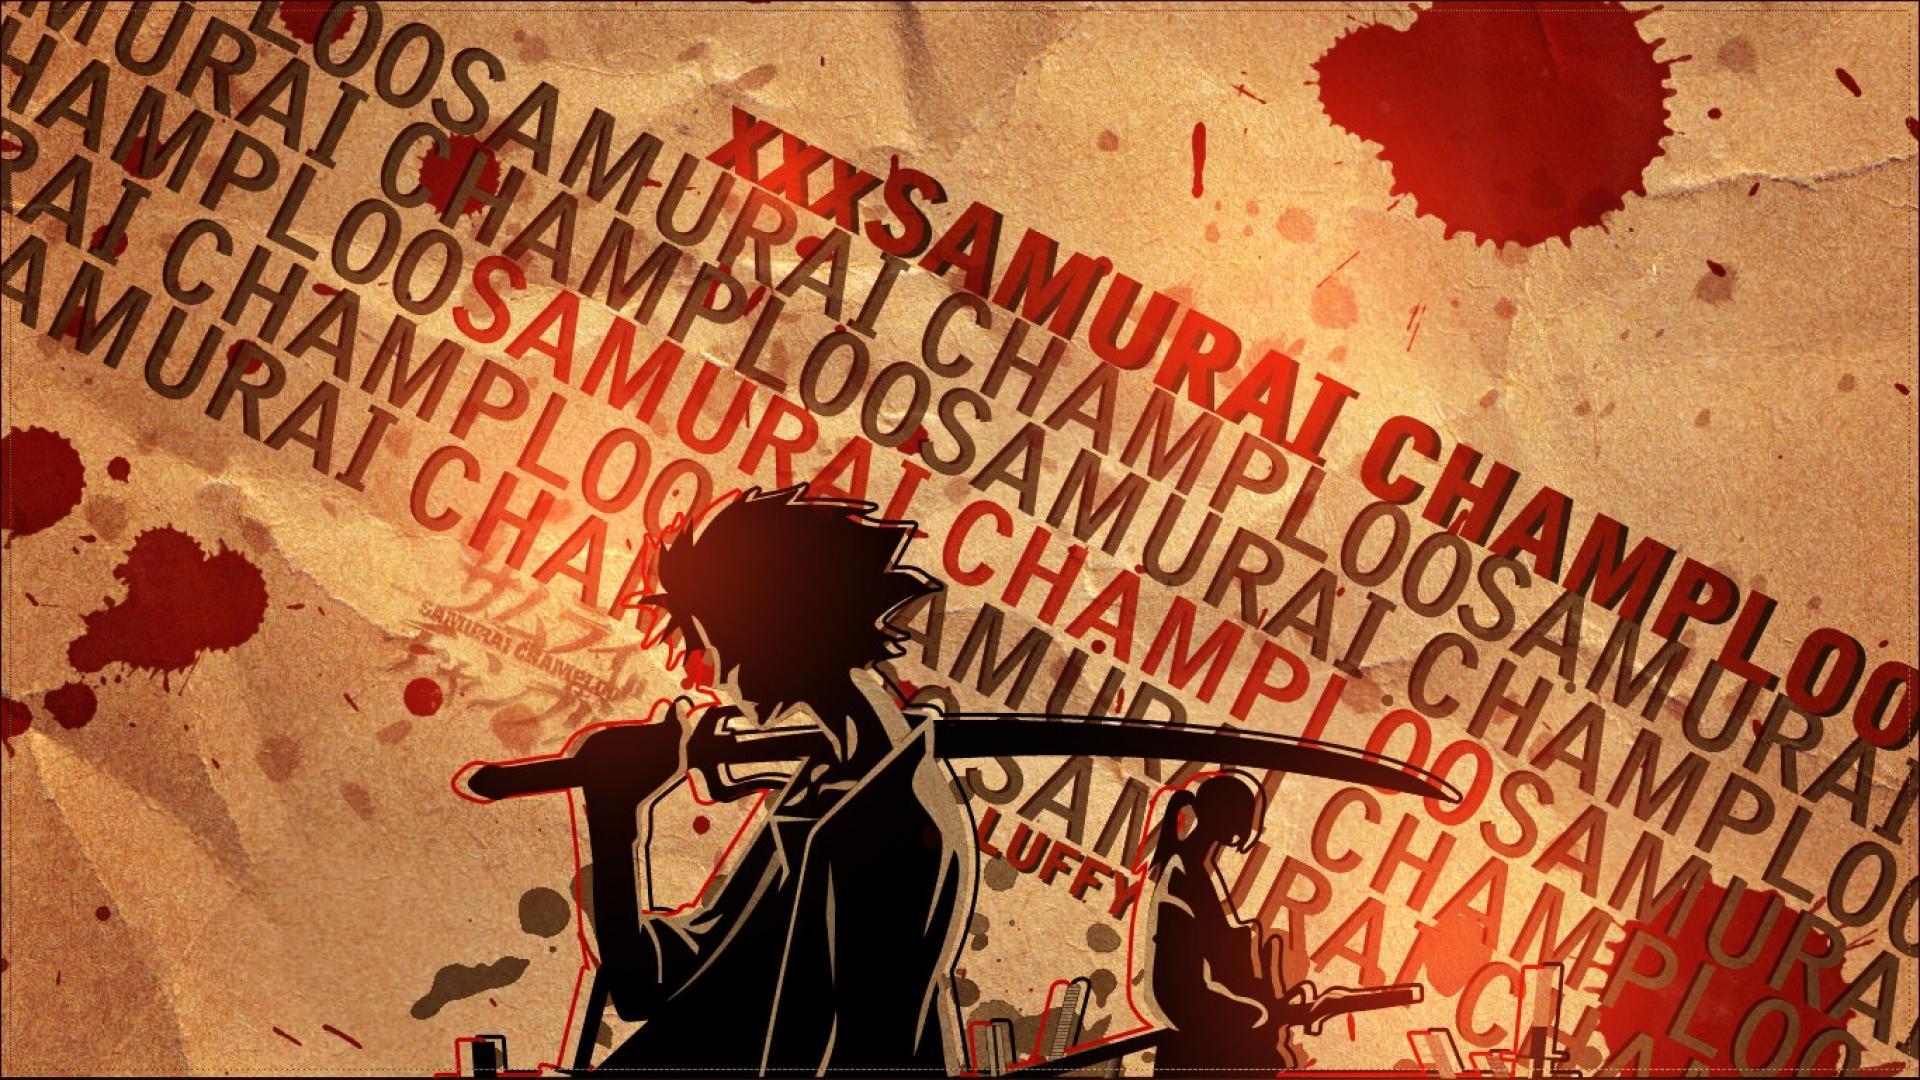 samurai champloo phone wallpaper